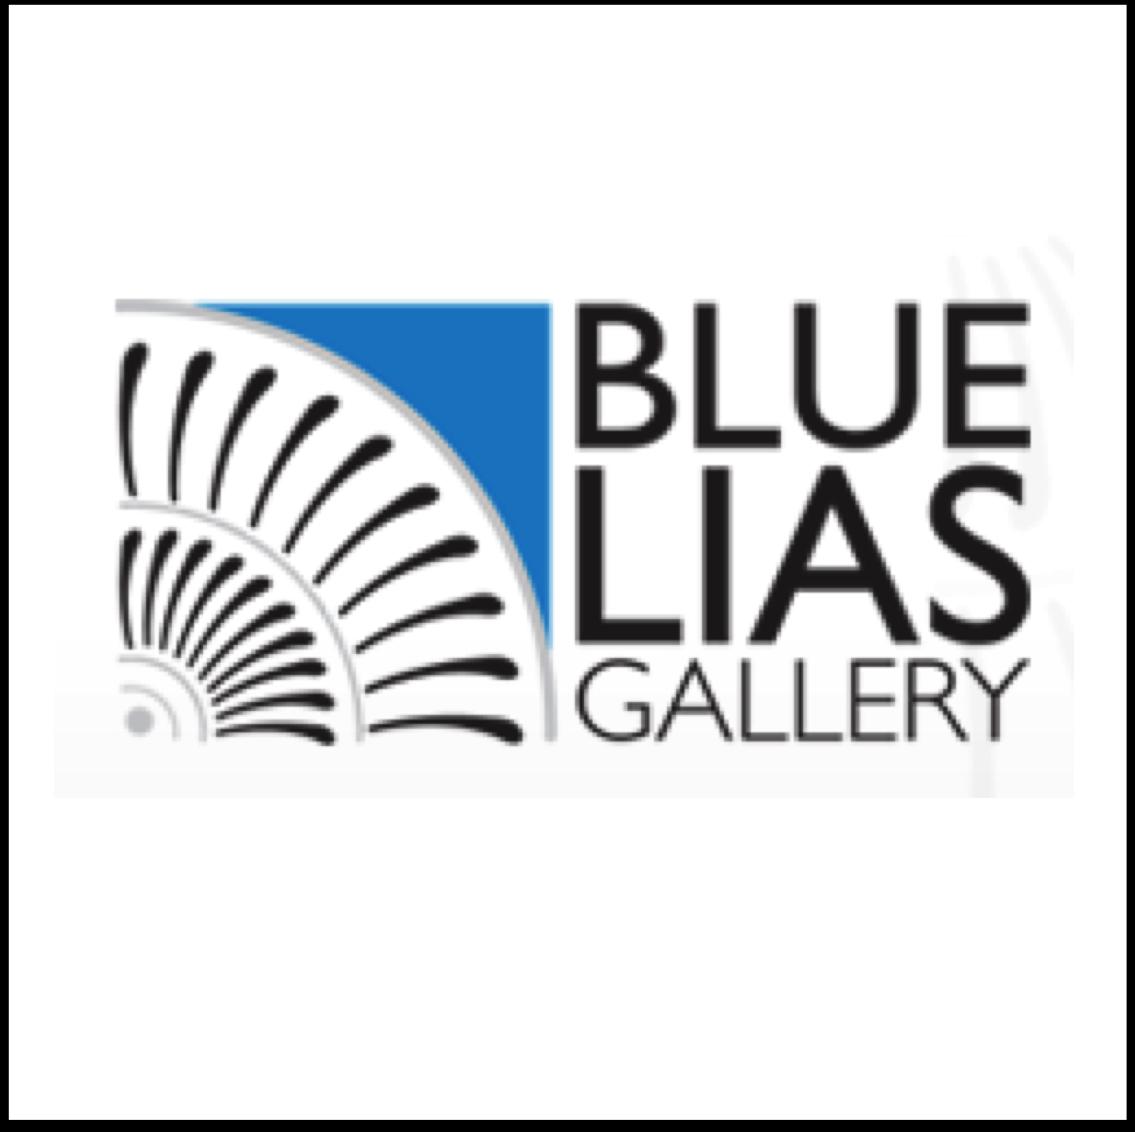 Blue Lias Gallery  Lyme Regis, Dorset